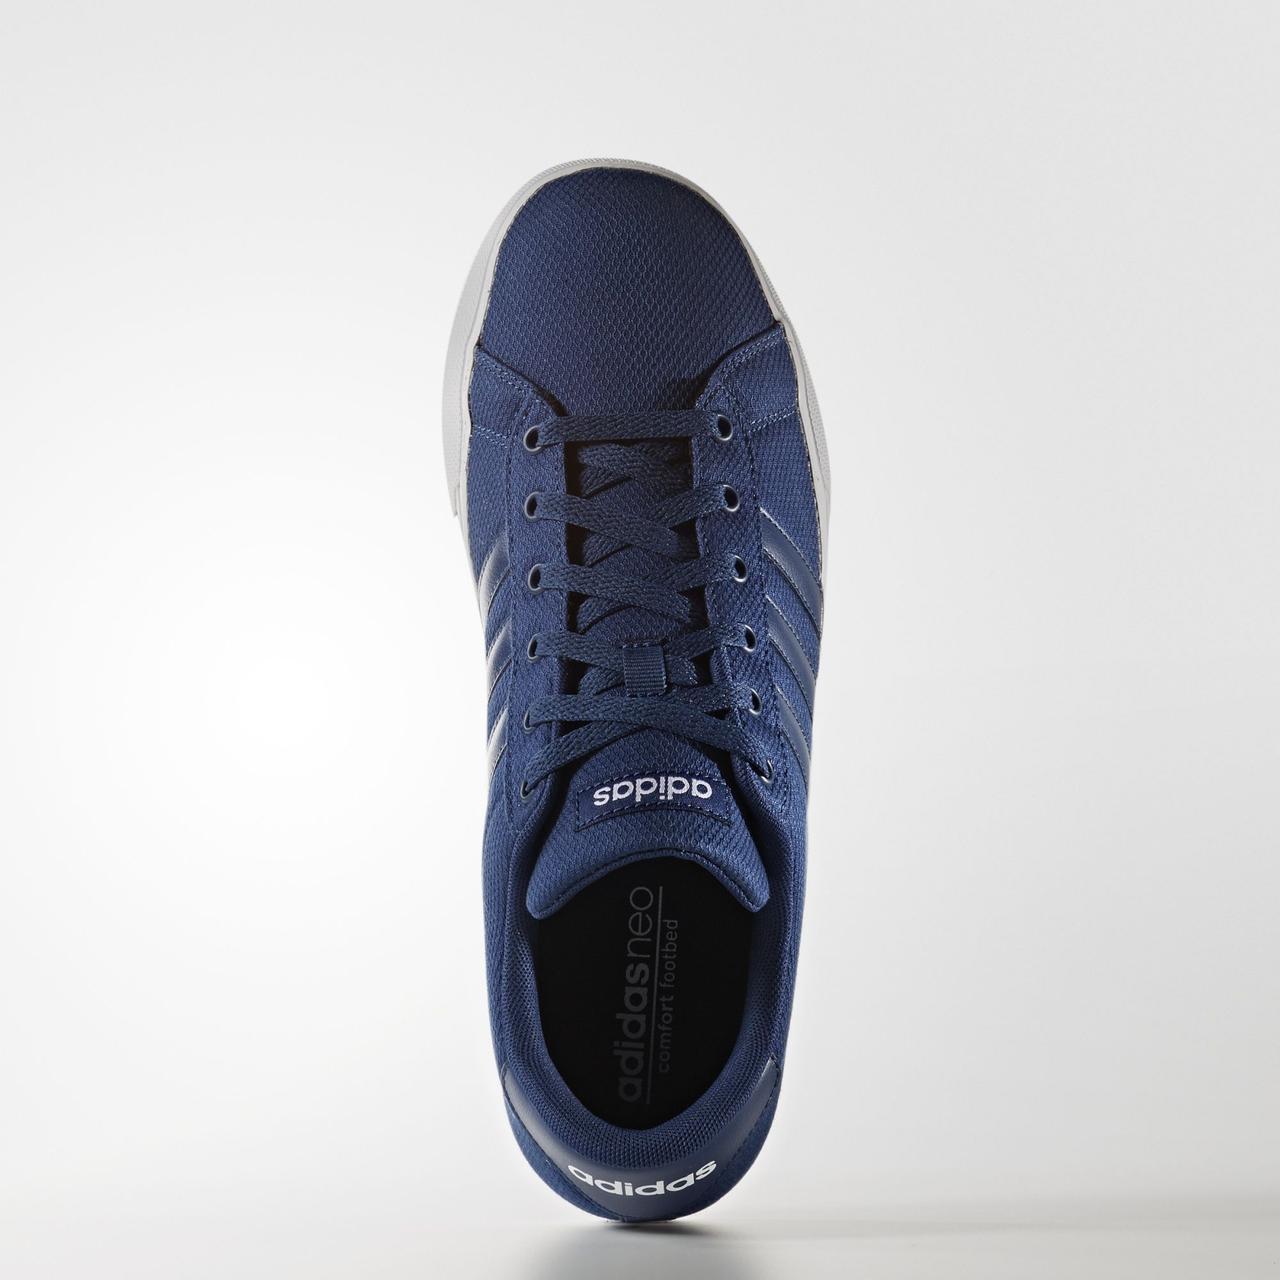 Купить Мужские кроссовки Adidas Neo Daily (Артикул  B74473) в ... 5977824b8f2